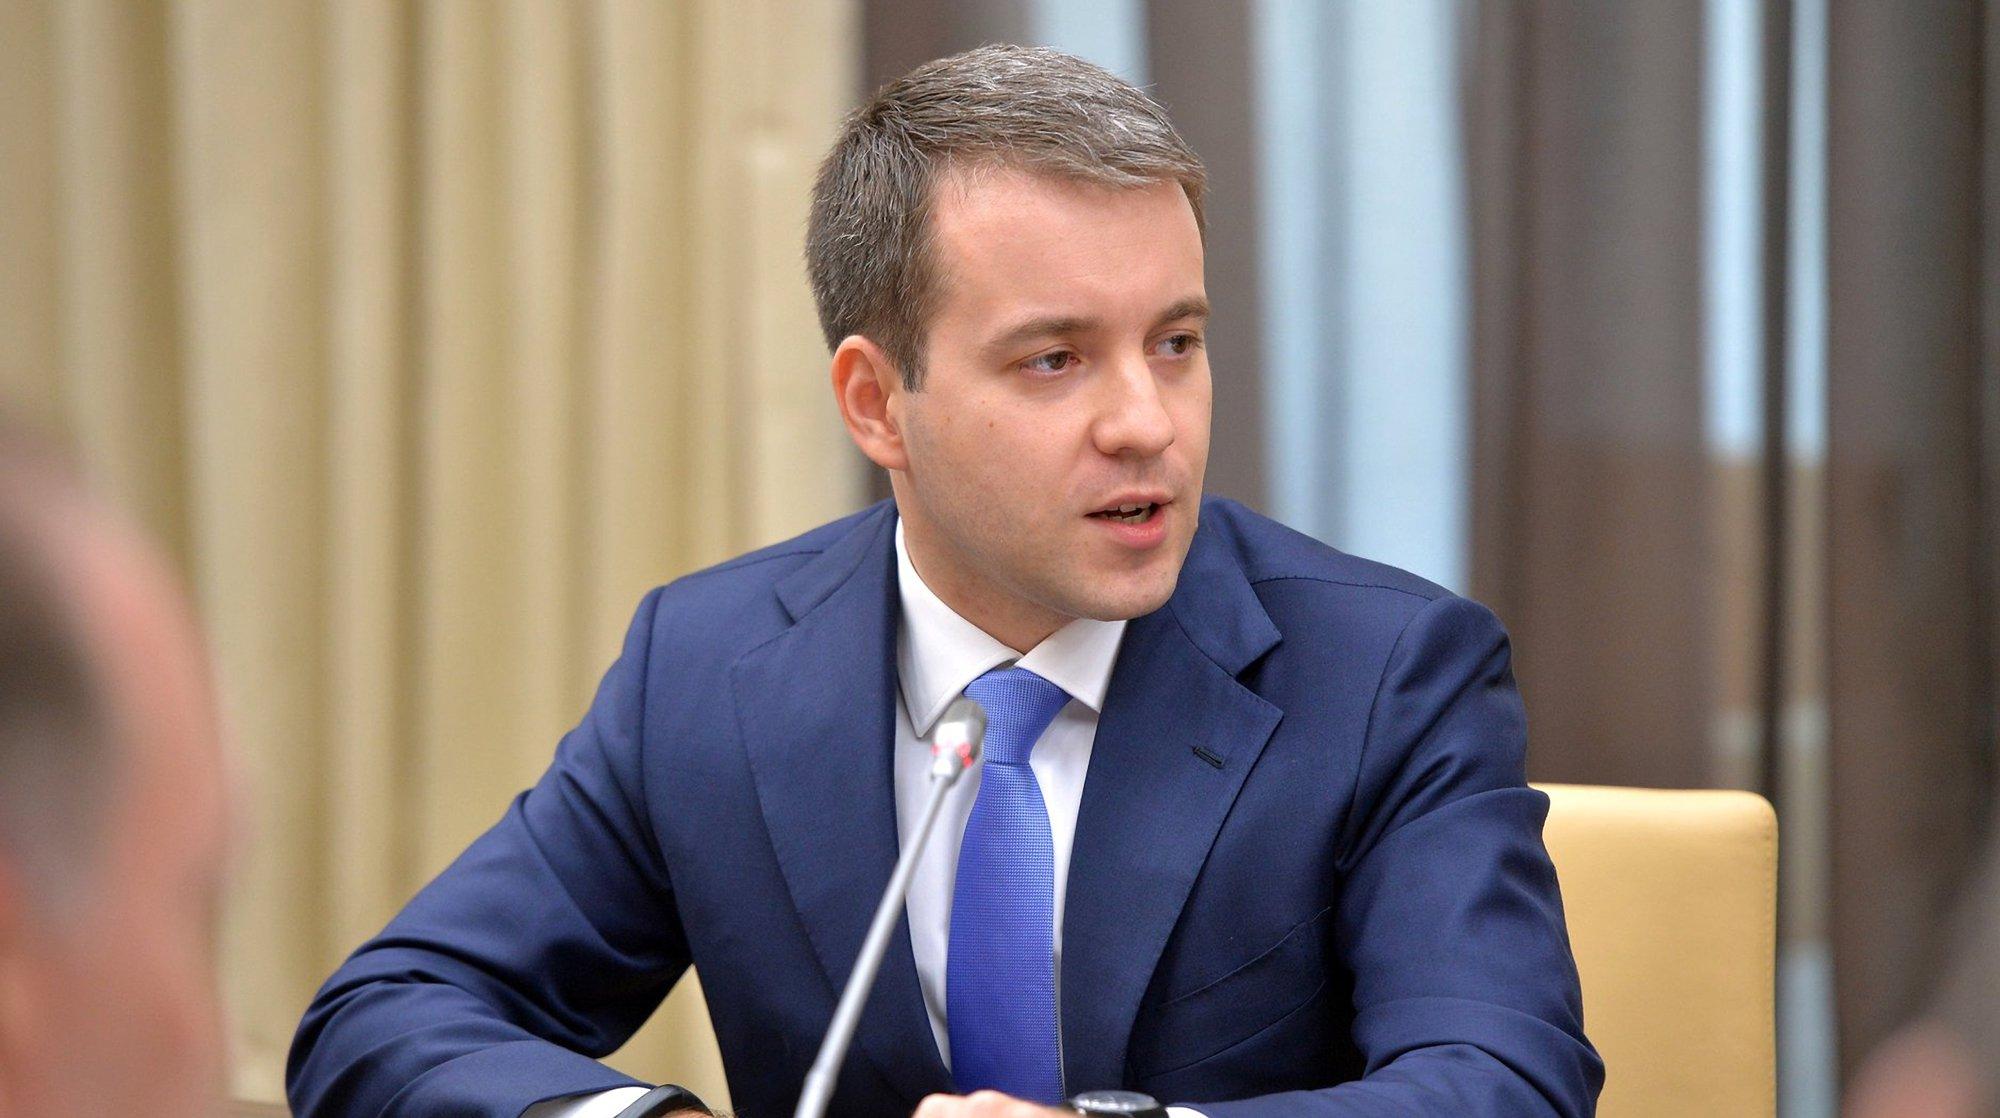 Руководитель Минкомсвязи исключил легализацию биткойнов вРФ